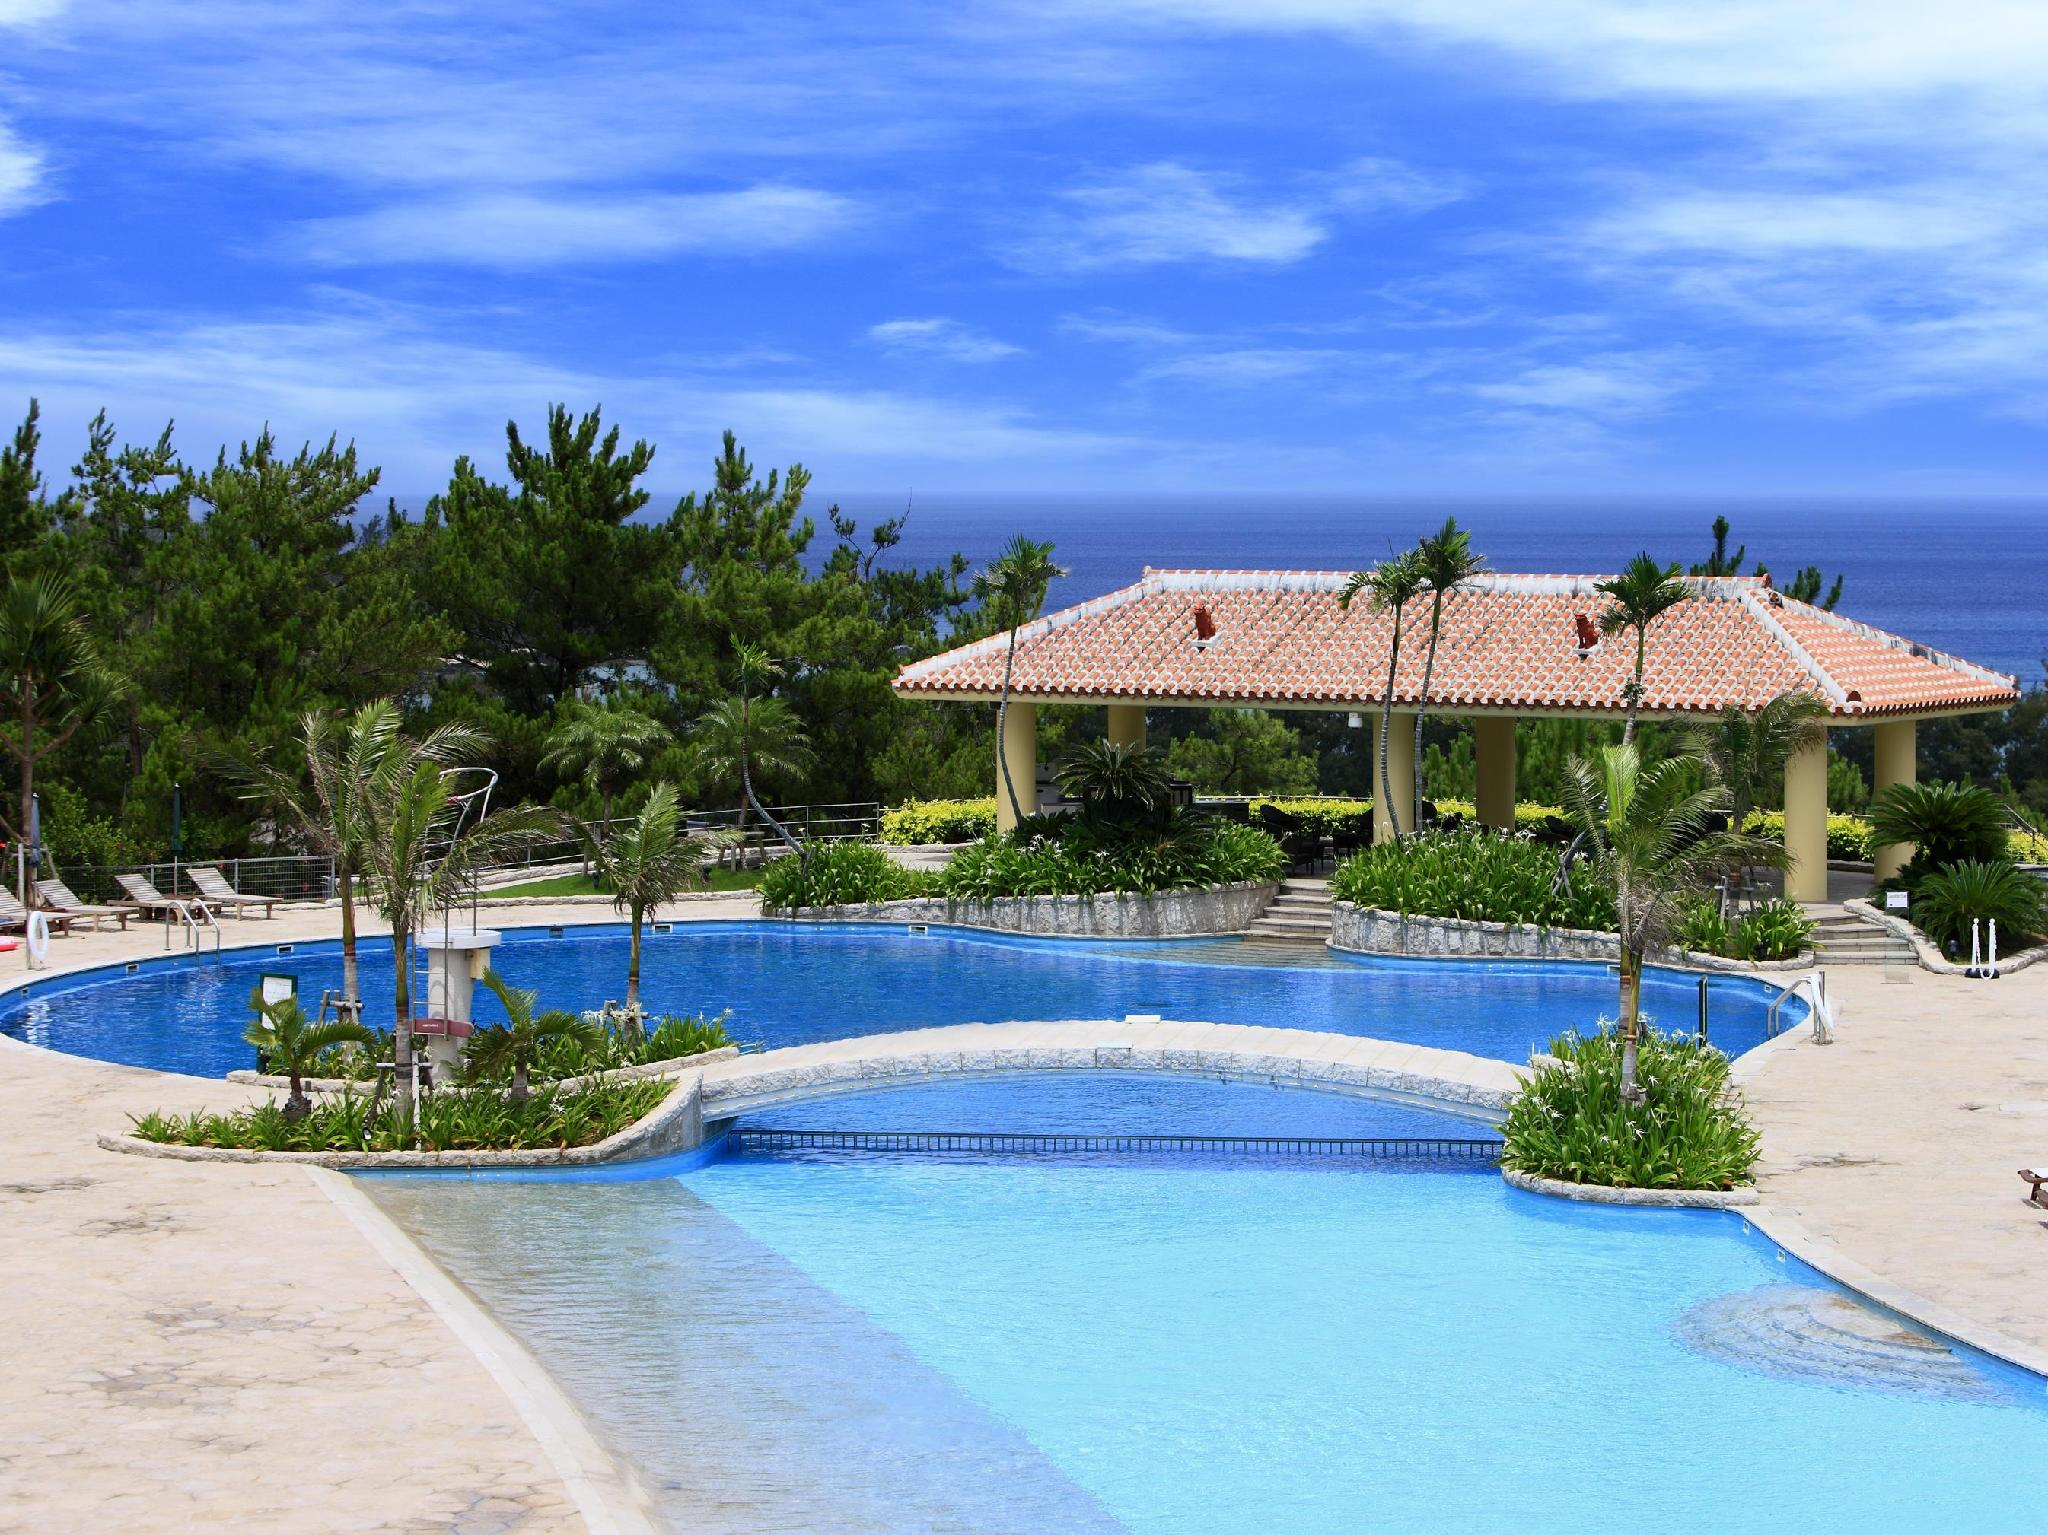 Okinawa Marriott Resort & Spa 4